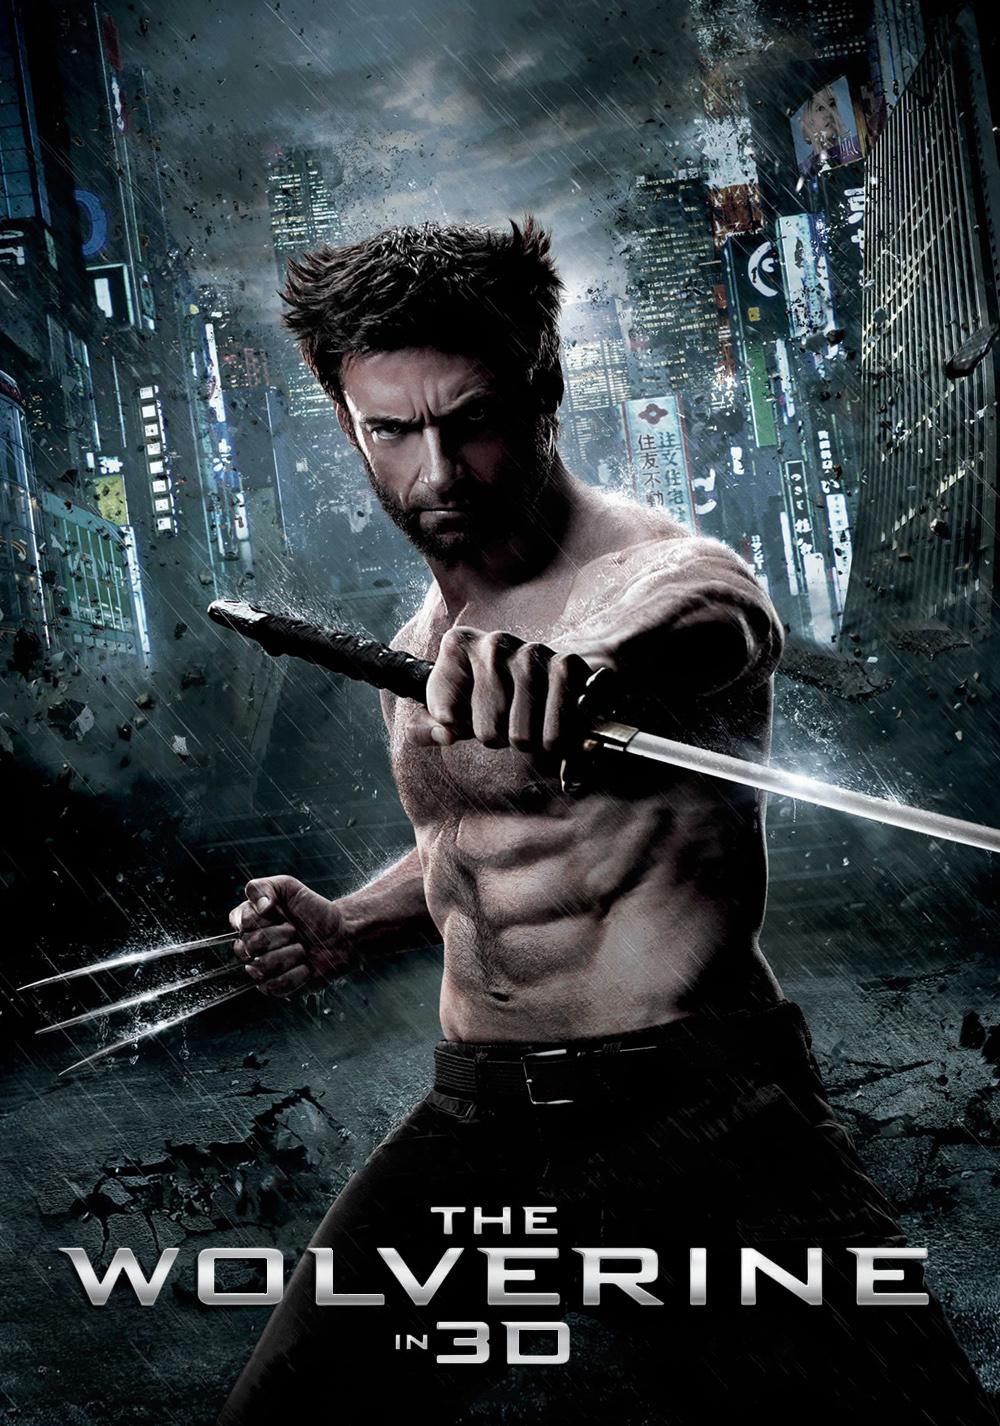 The Wolverine | Movie fanart | fanart.tv